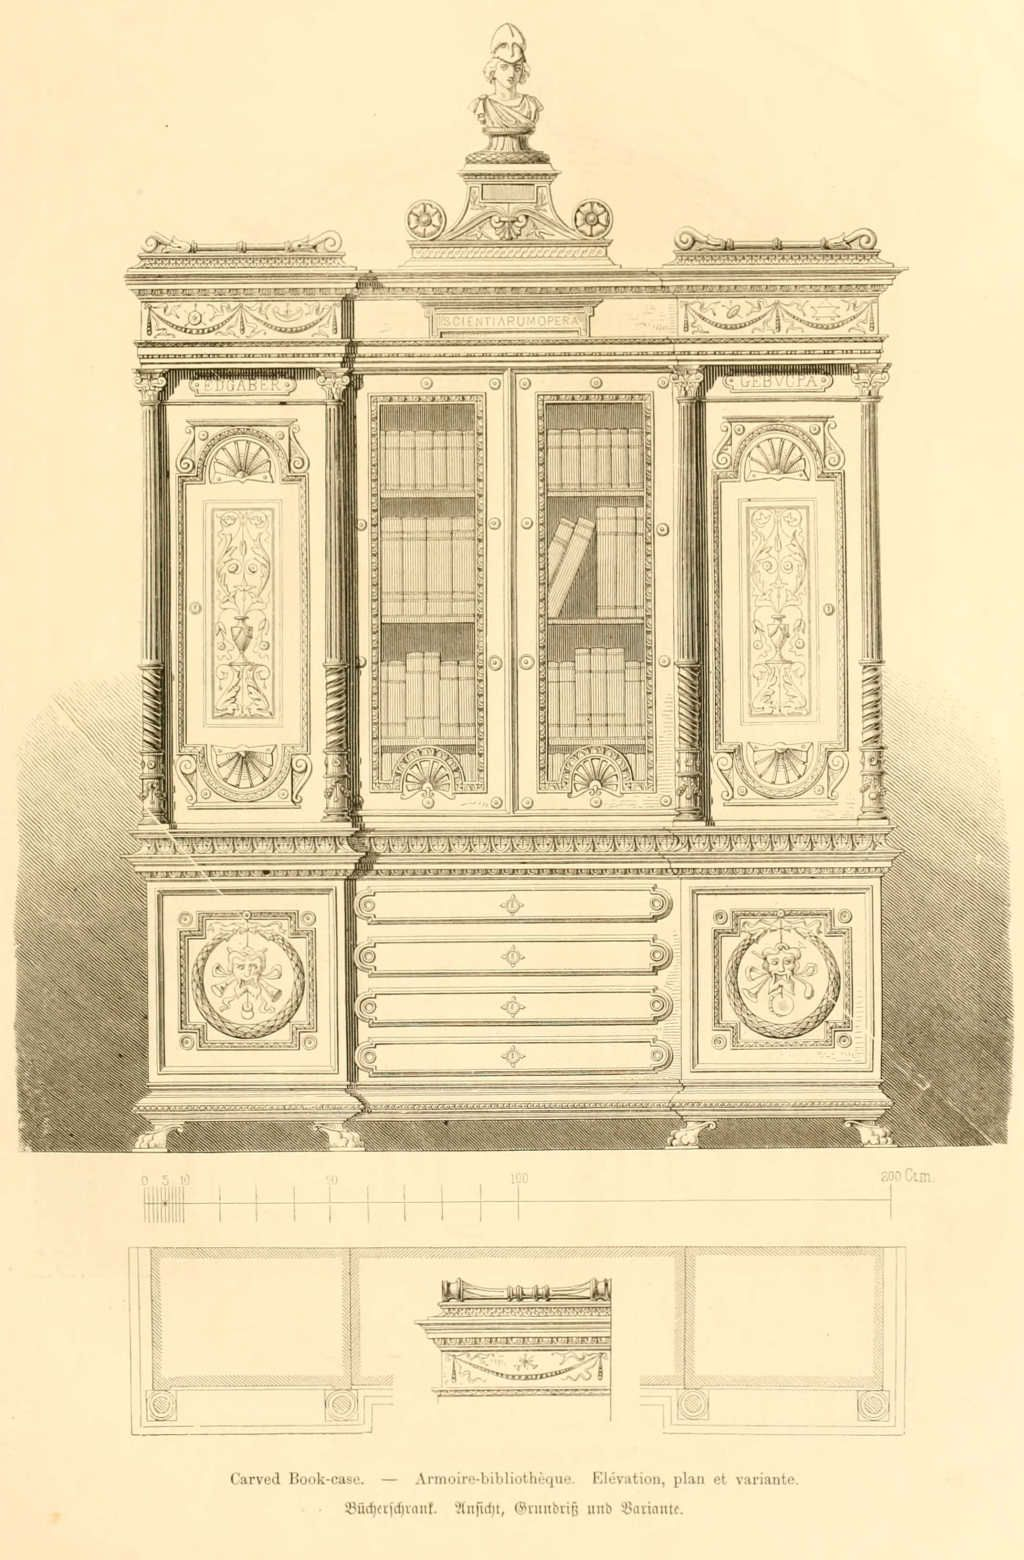 Armoire Bibliotheque Jpg Dessins De Meubles Mobilier Mobilier De Salon Catalogue De Meubles Mobilier De France